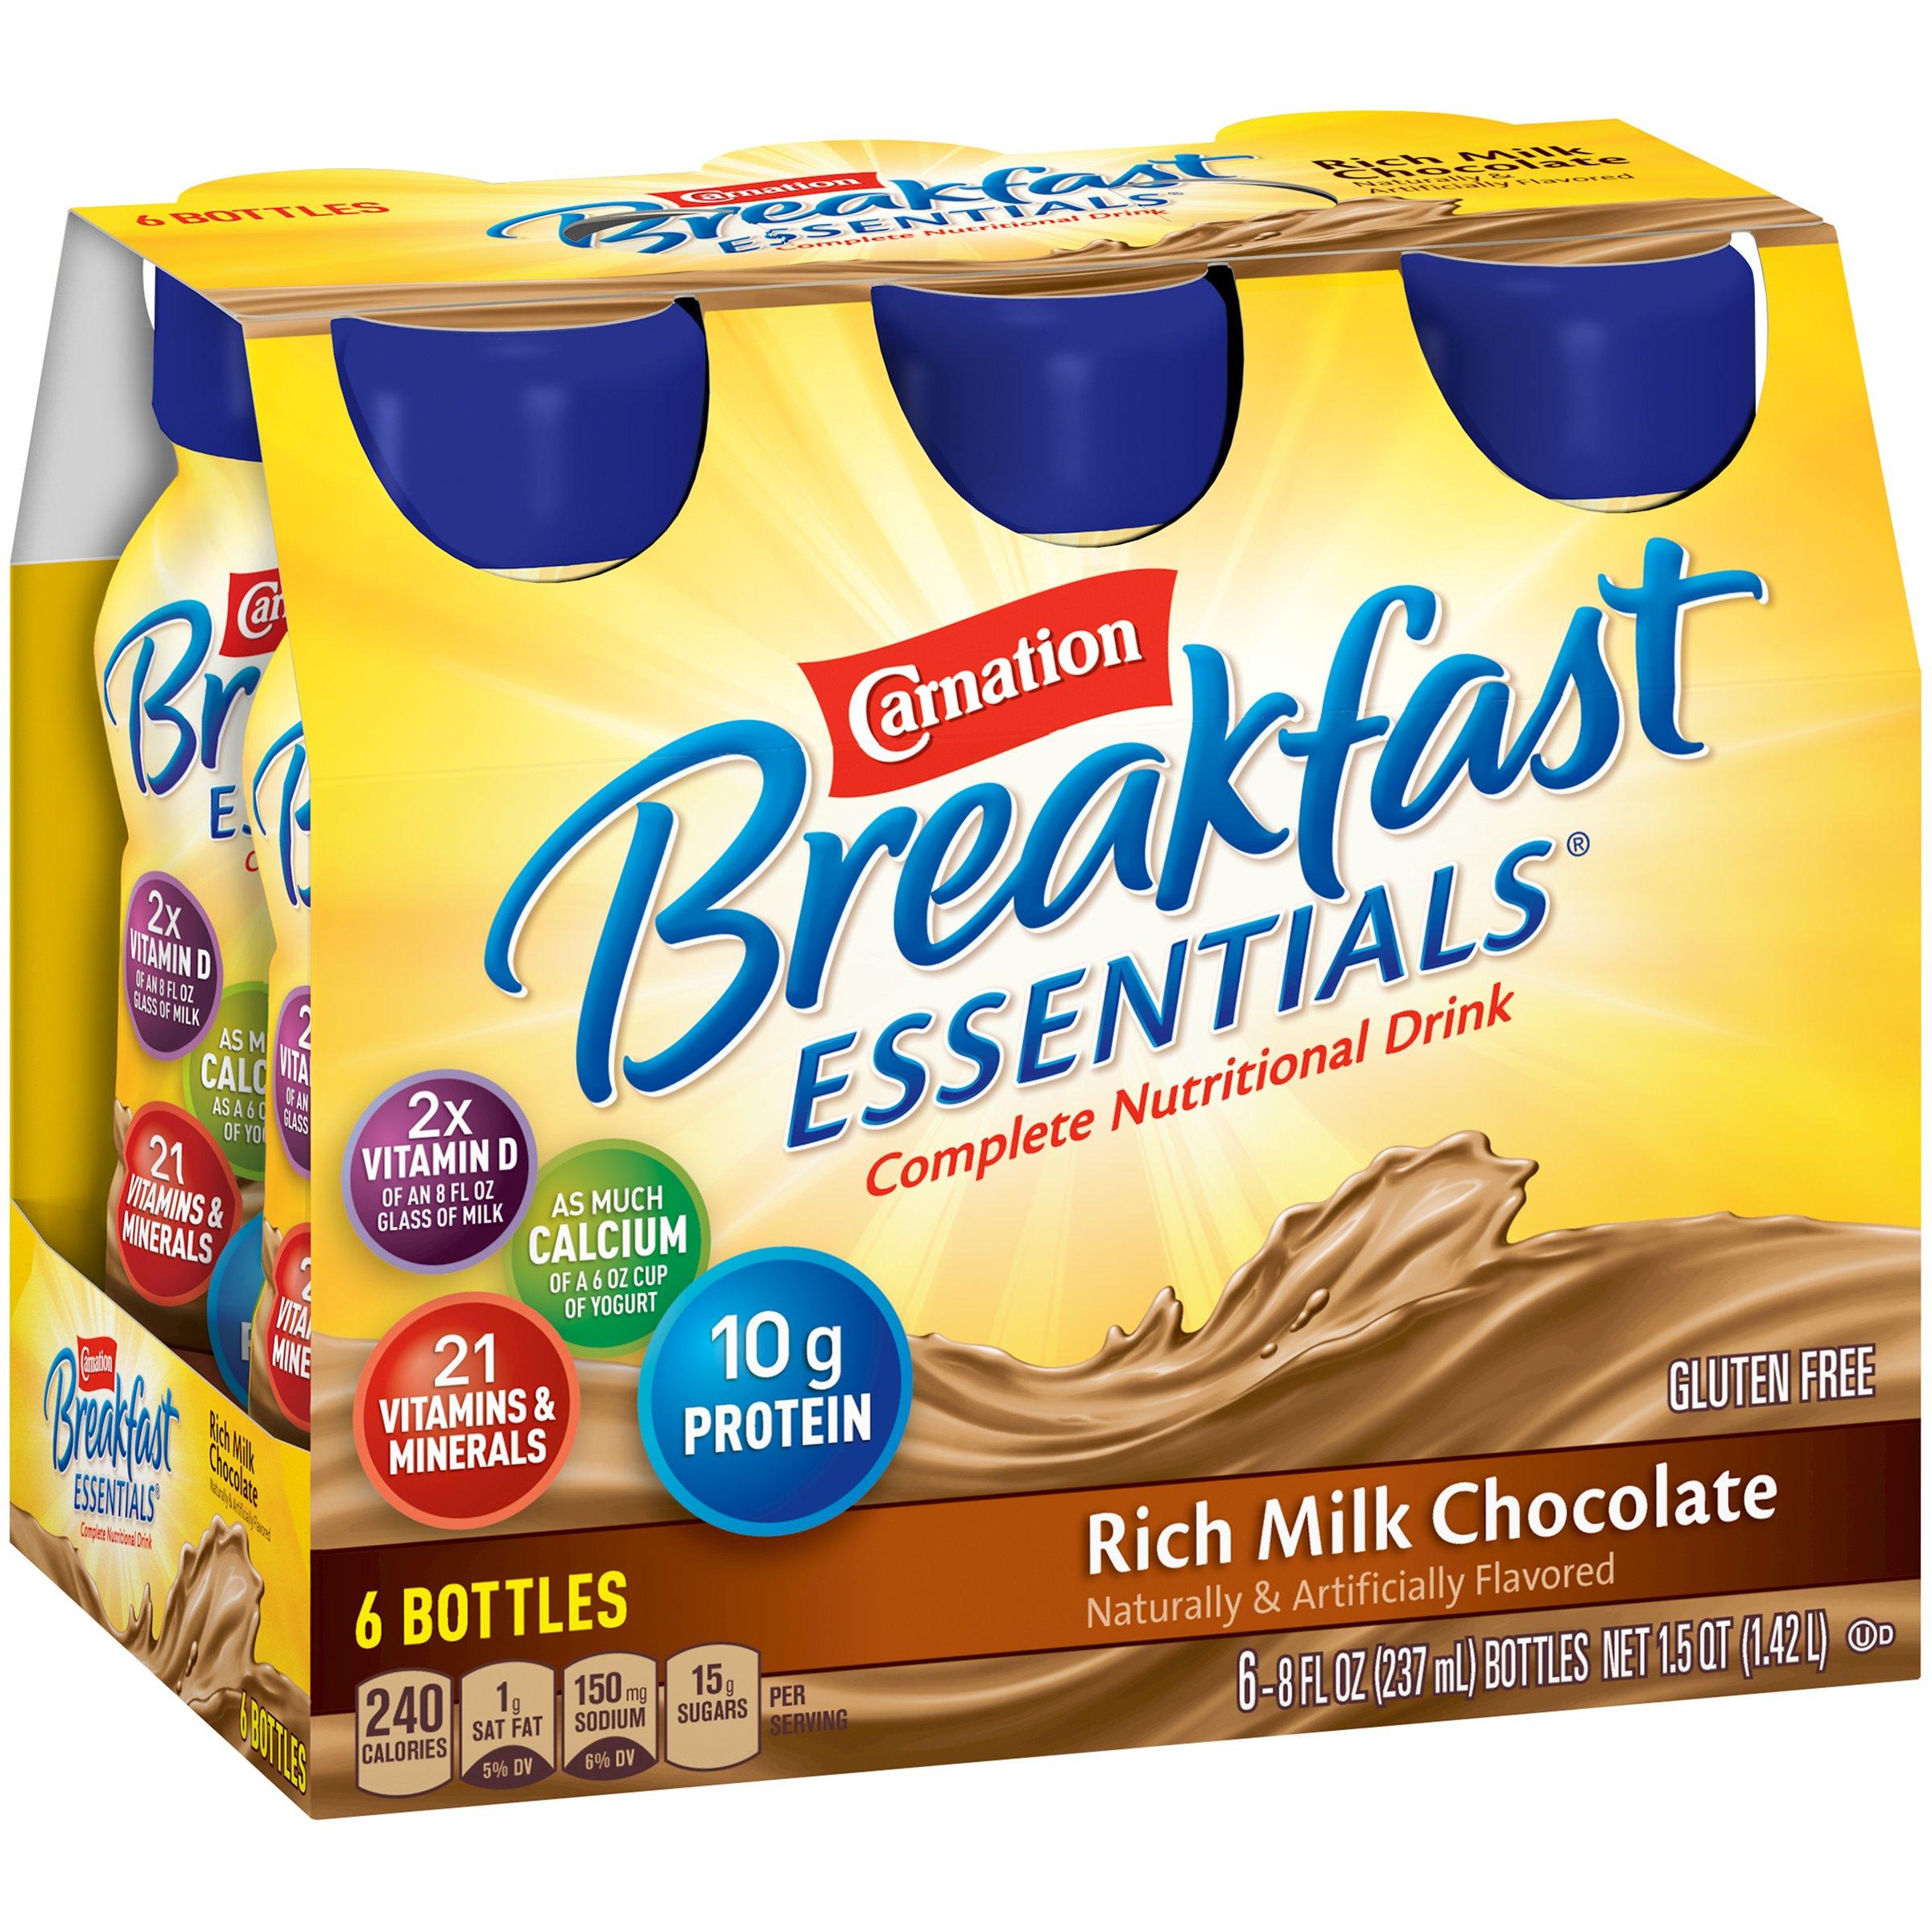 Carnation Breakfast Essentials Ready-to-Drink, Rich Milk Chocolate, 8 fl oz Bottle, 24 Pack by Carnation Breakfast Essentials